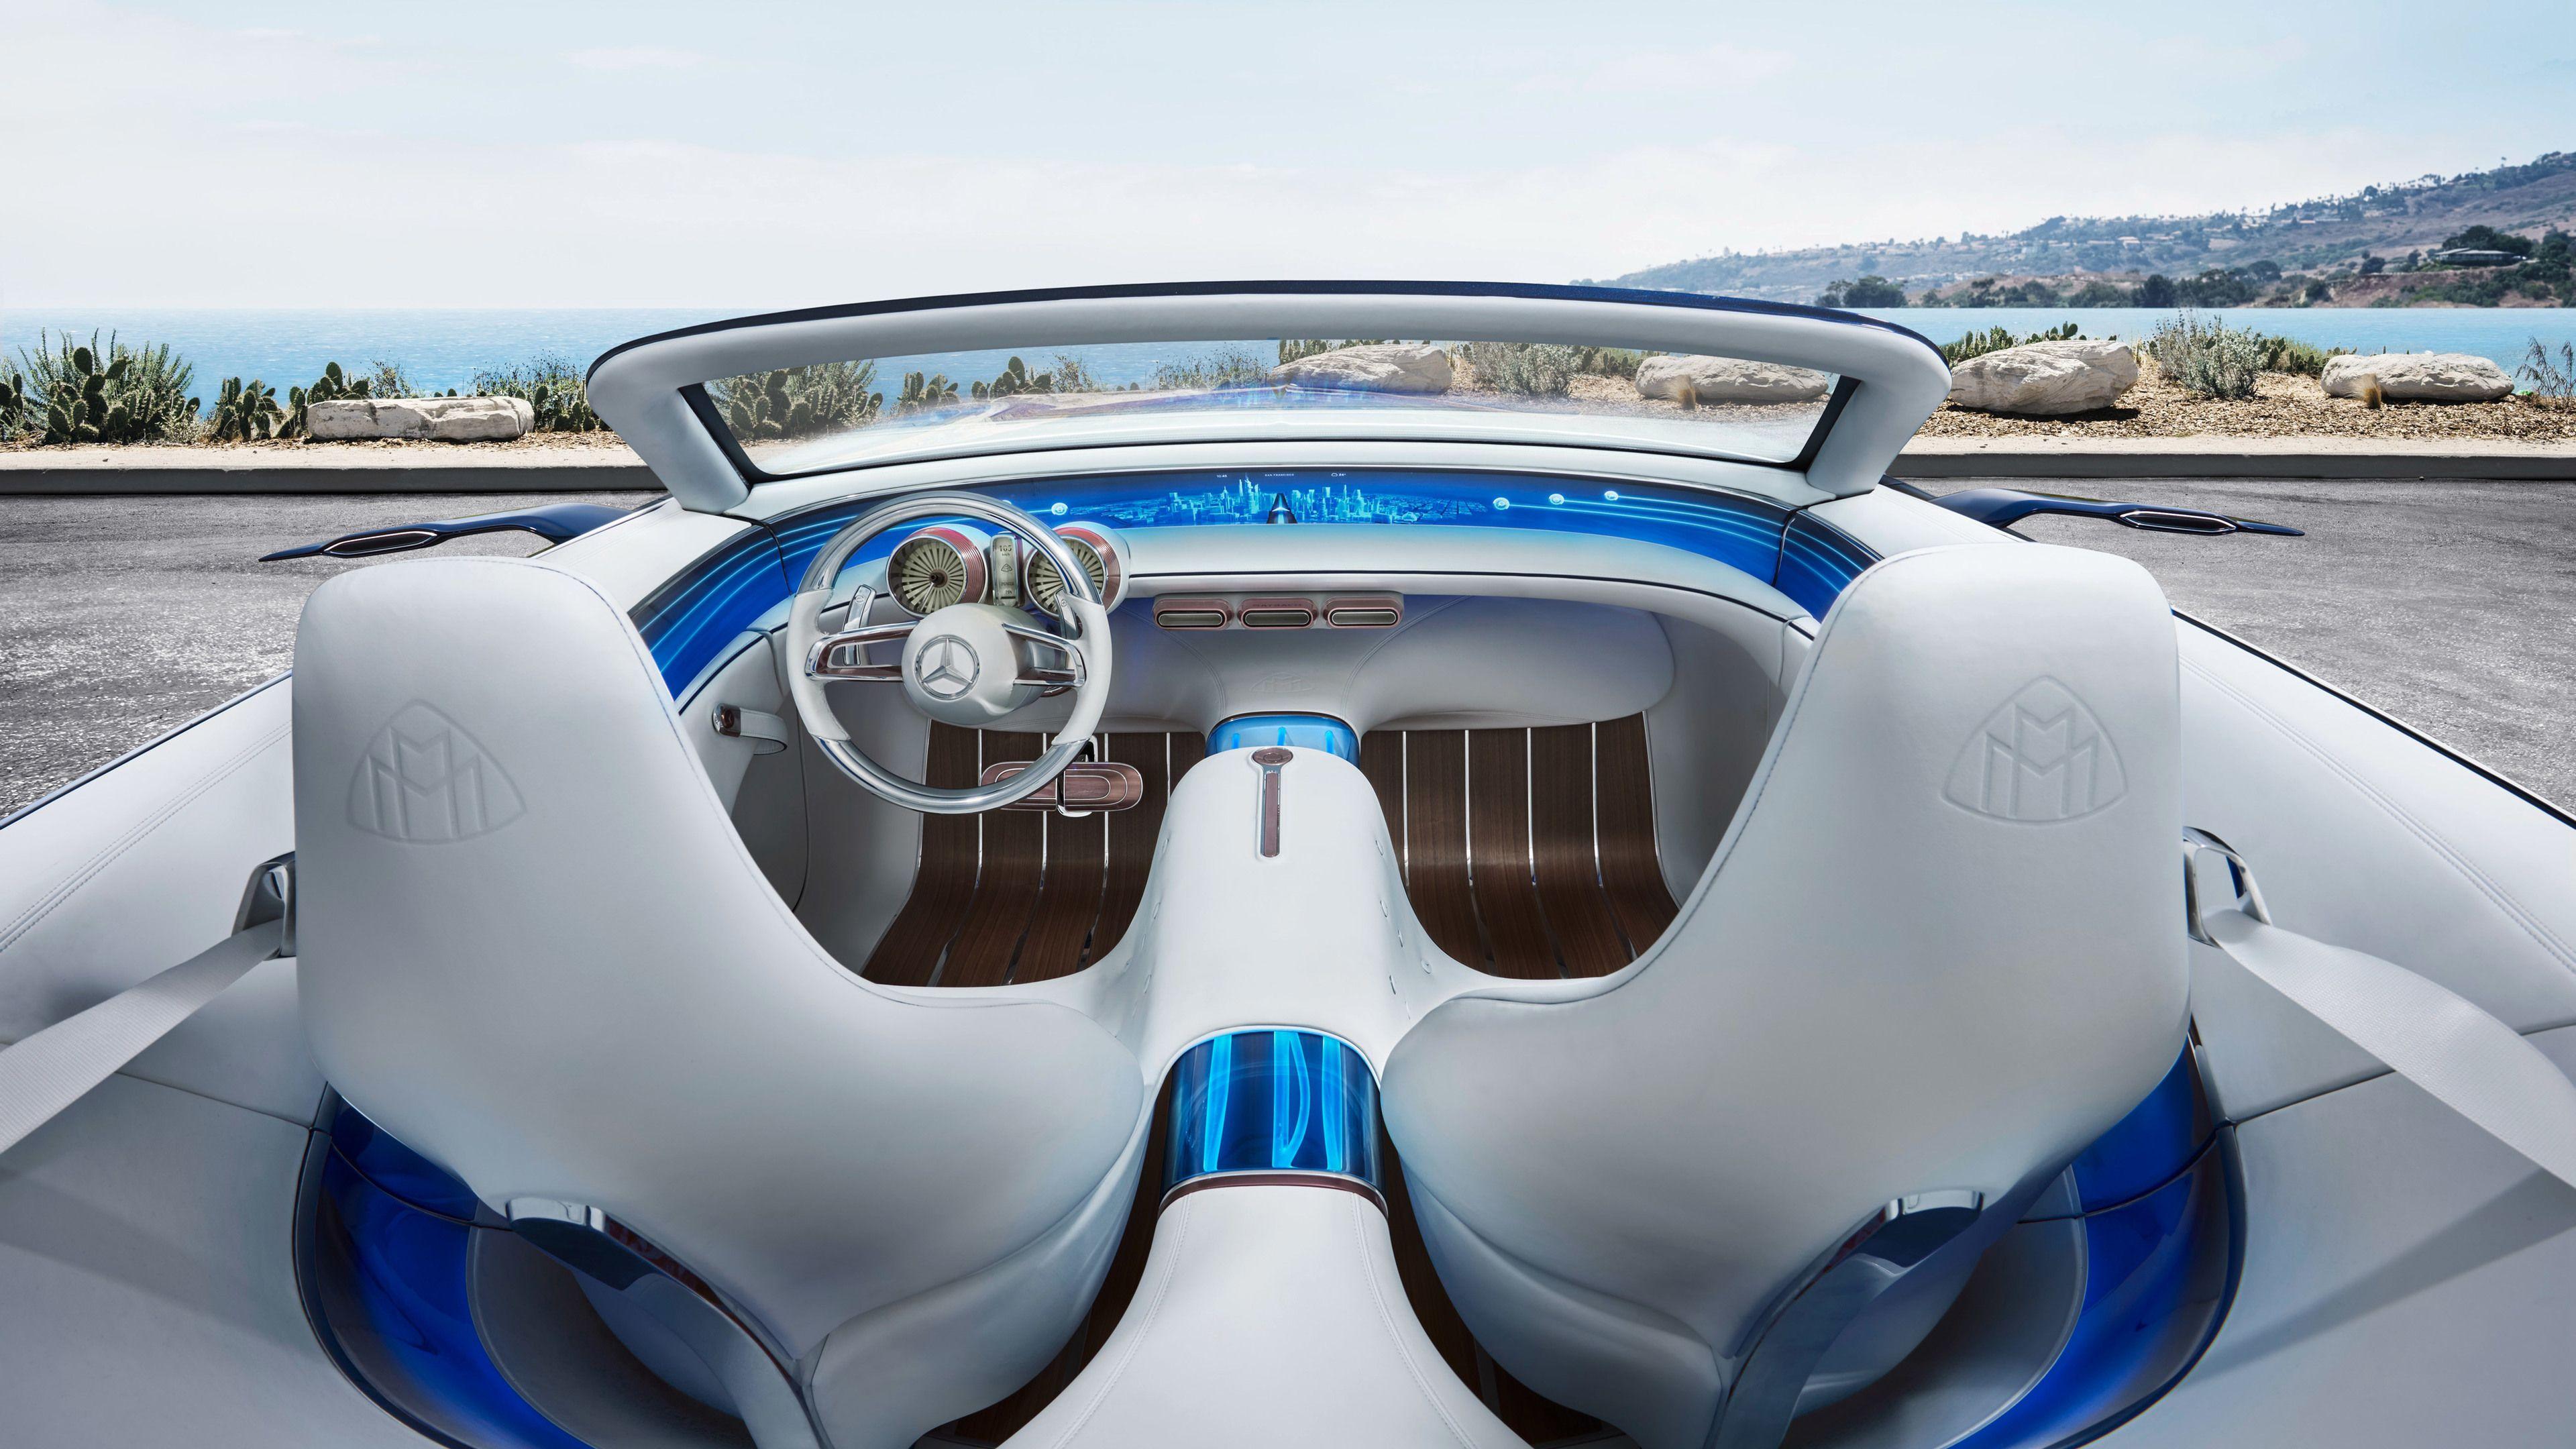 Vision Mercedes Maybach 6 Cabriolet Interior mercedes wallpapers, mercedes mayba…